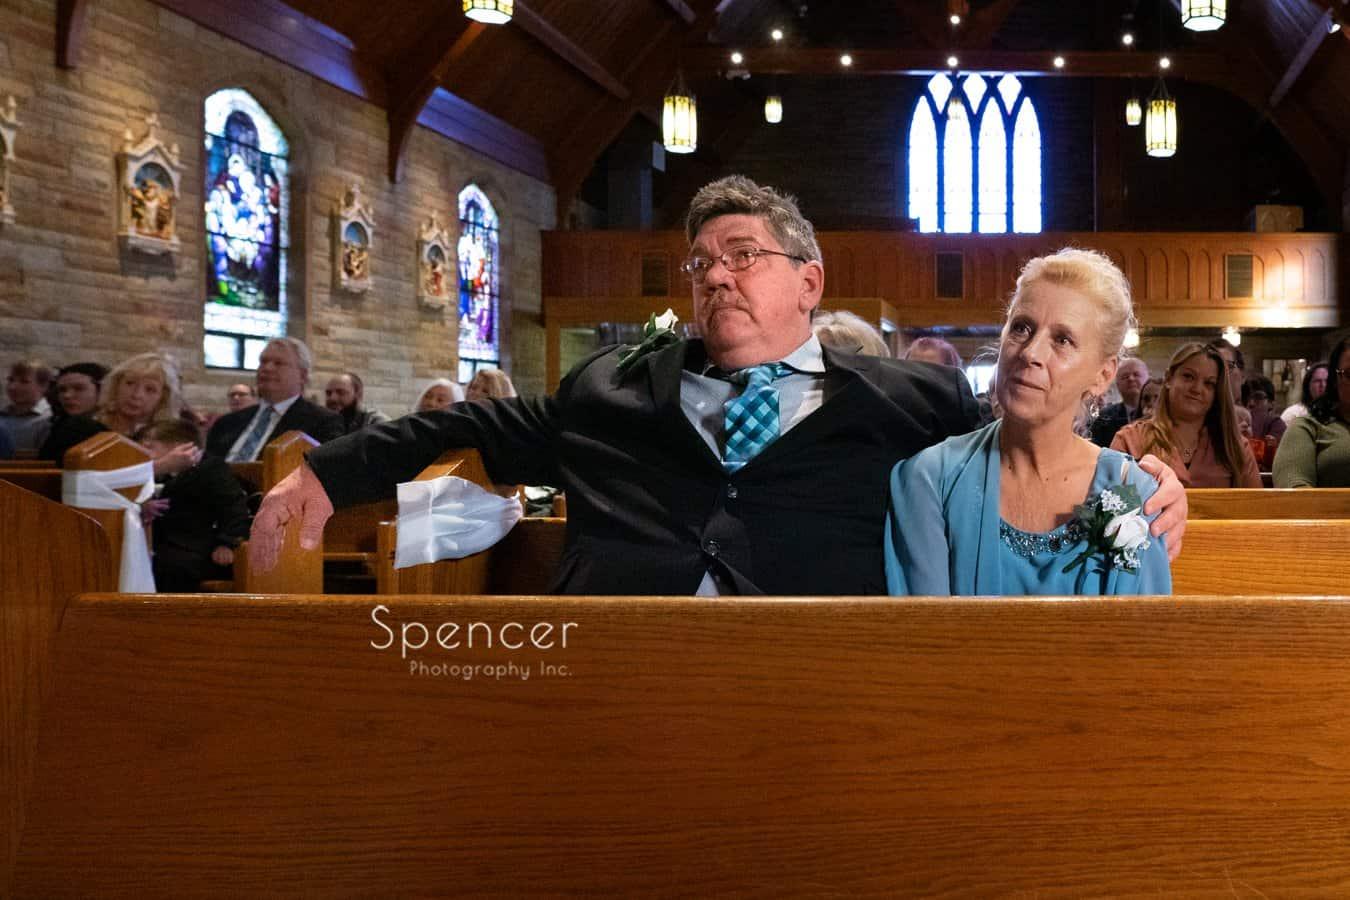 brides parents watching wedding ceremony in Indiana